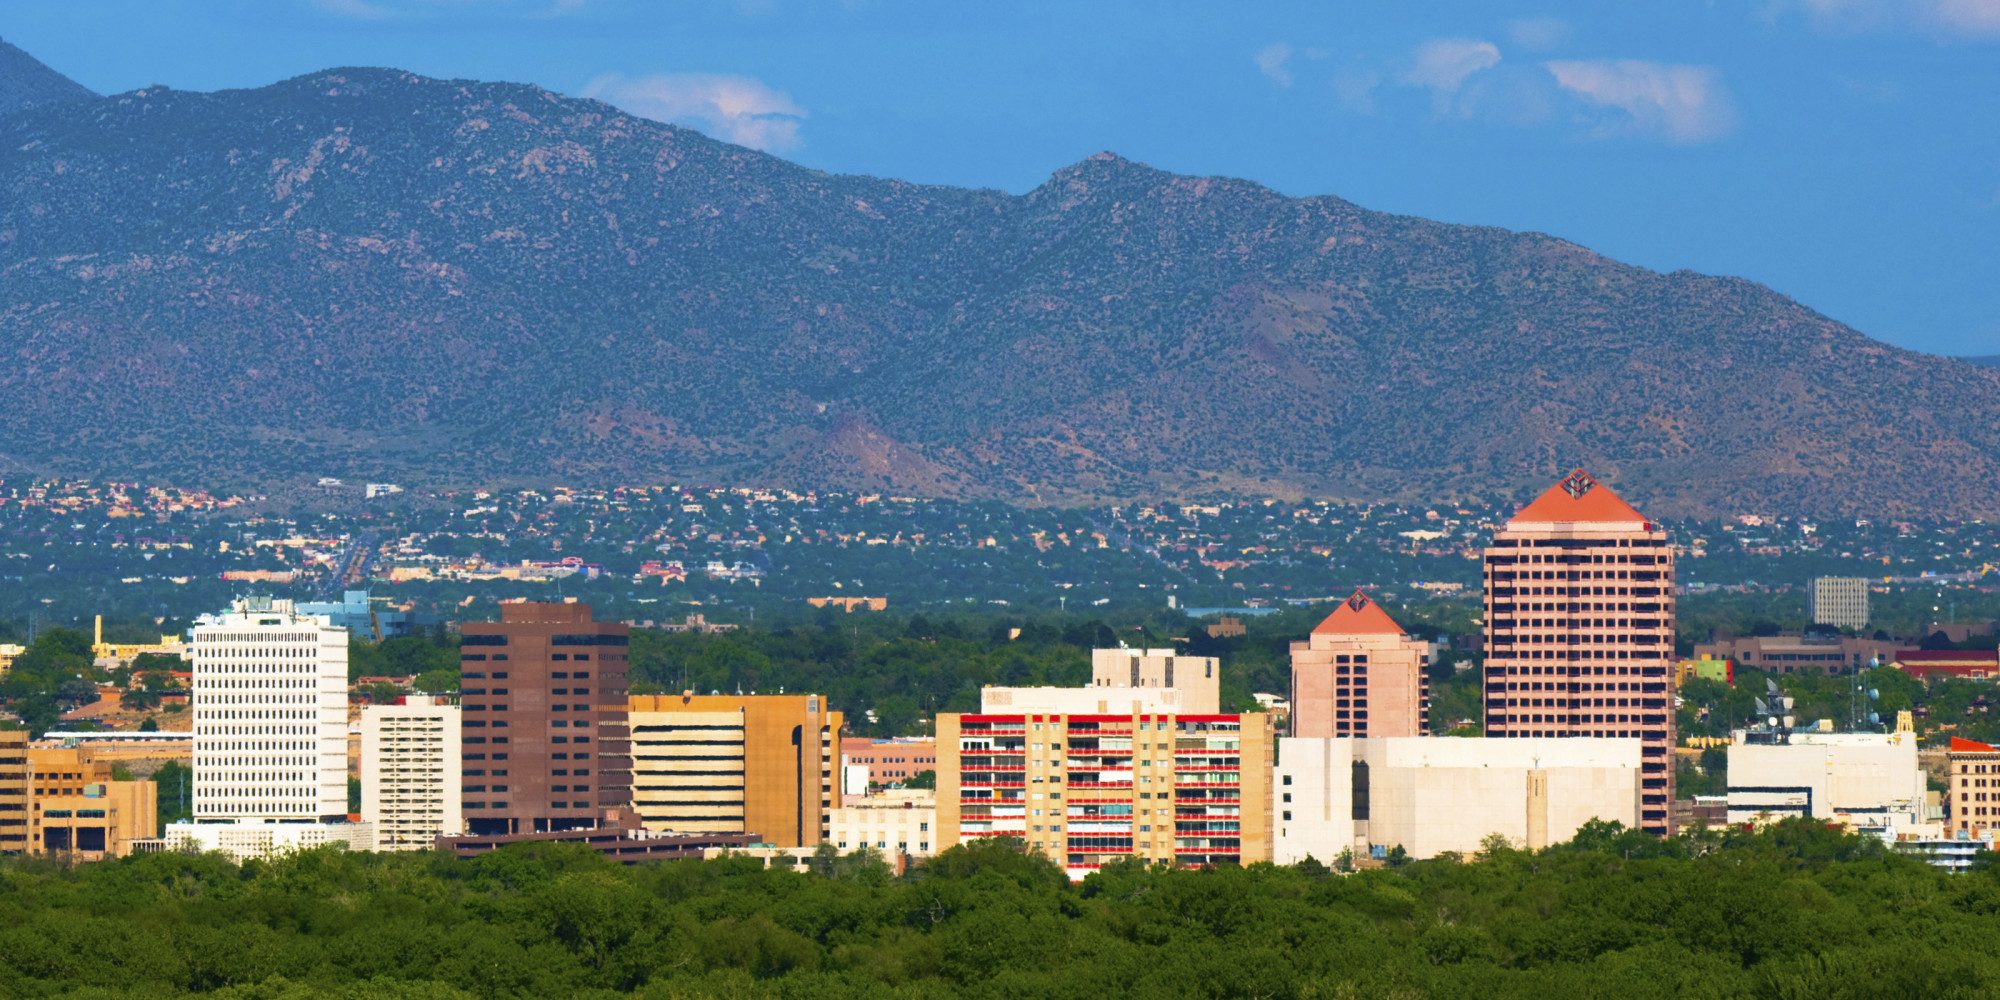 Albuquerque To Santa Fe >> Albuquerque Election: Voters Deciding Whether To Outlaw Late-Term Abortions